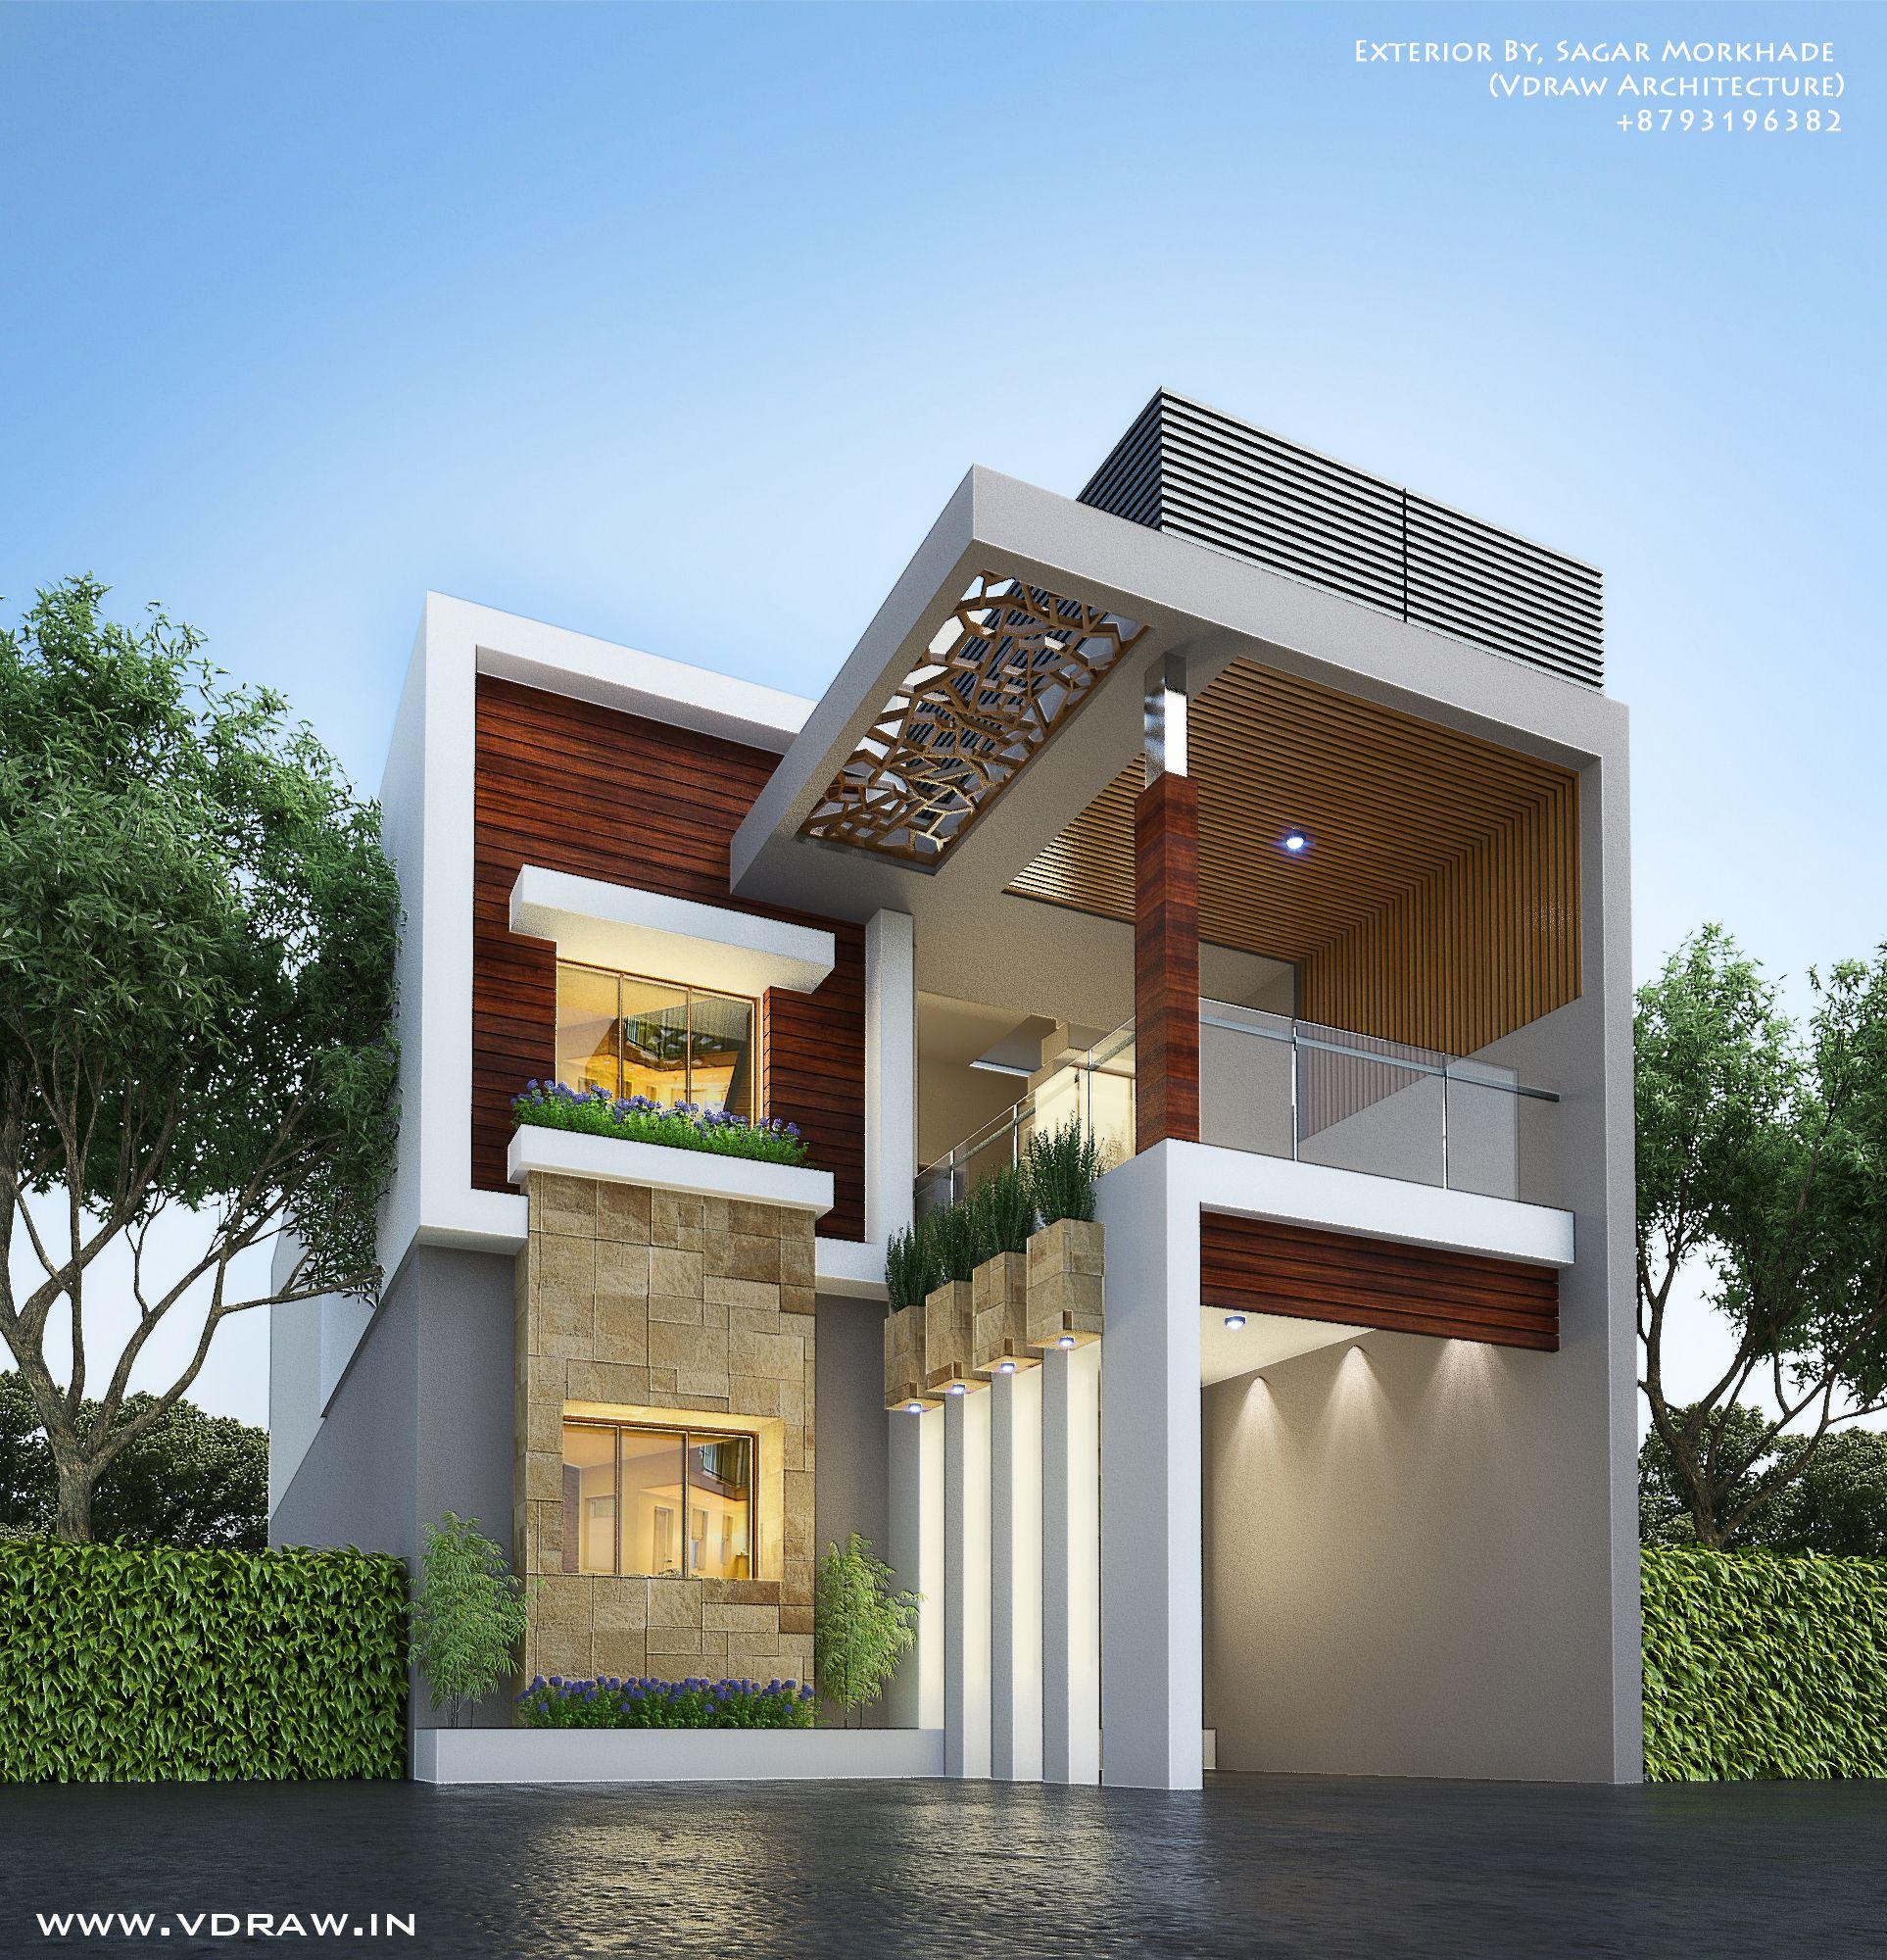 Exterior Ar.sagar Morkhade Vdraw Architecture